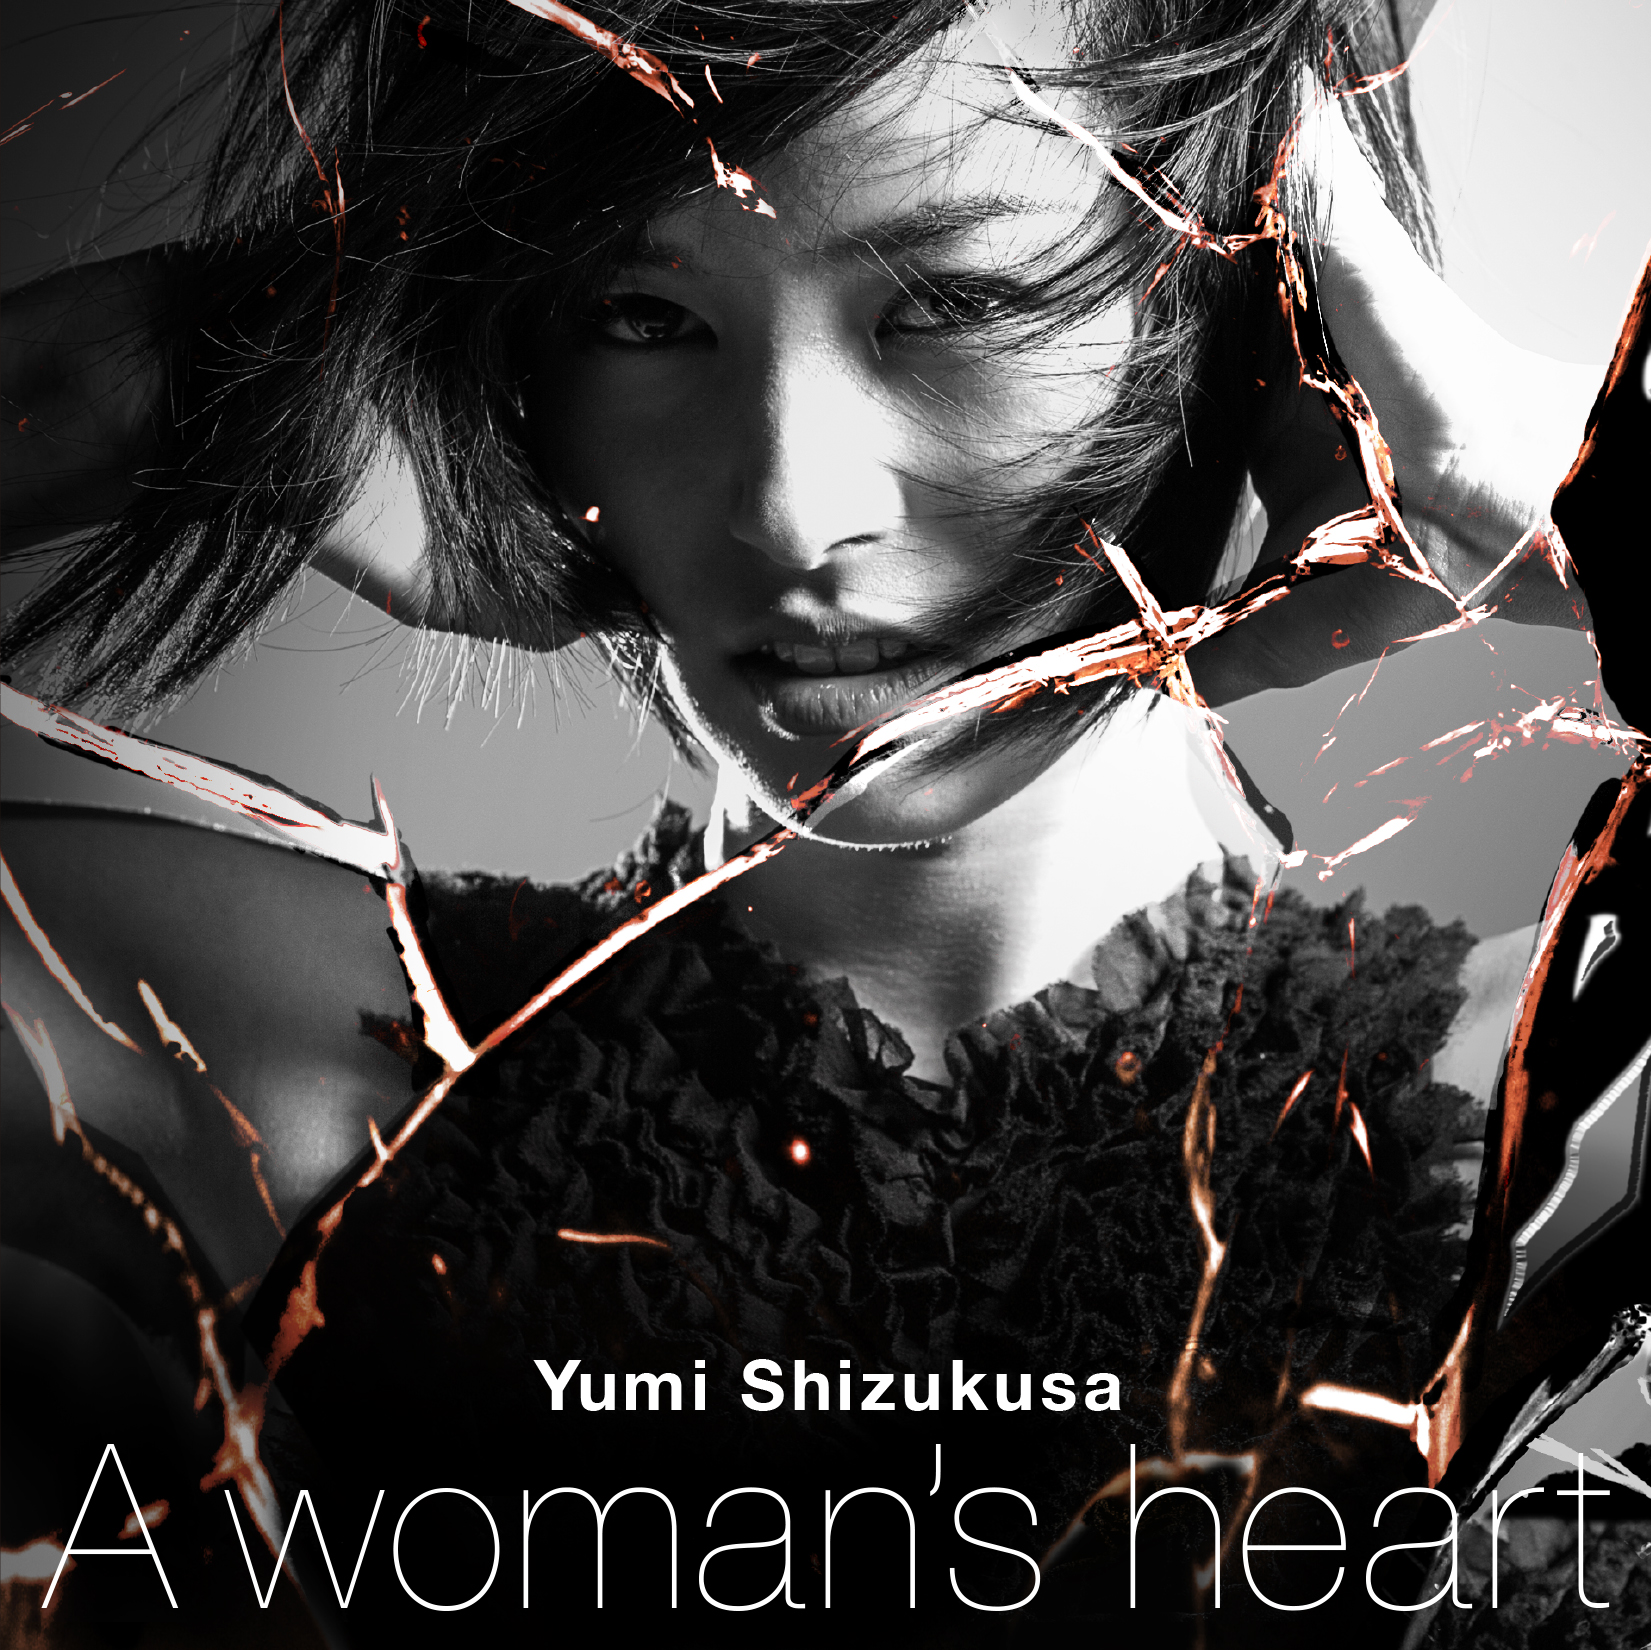 20170120.44.38 Yumi Shizukusa - A woman's heart (MP3) cover.jpg